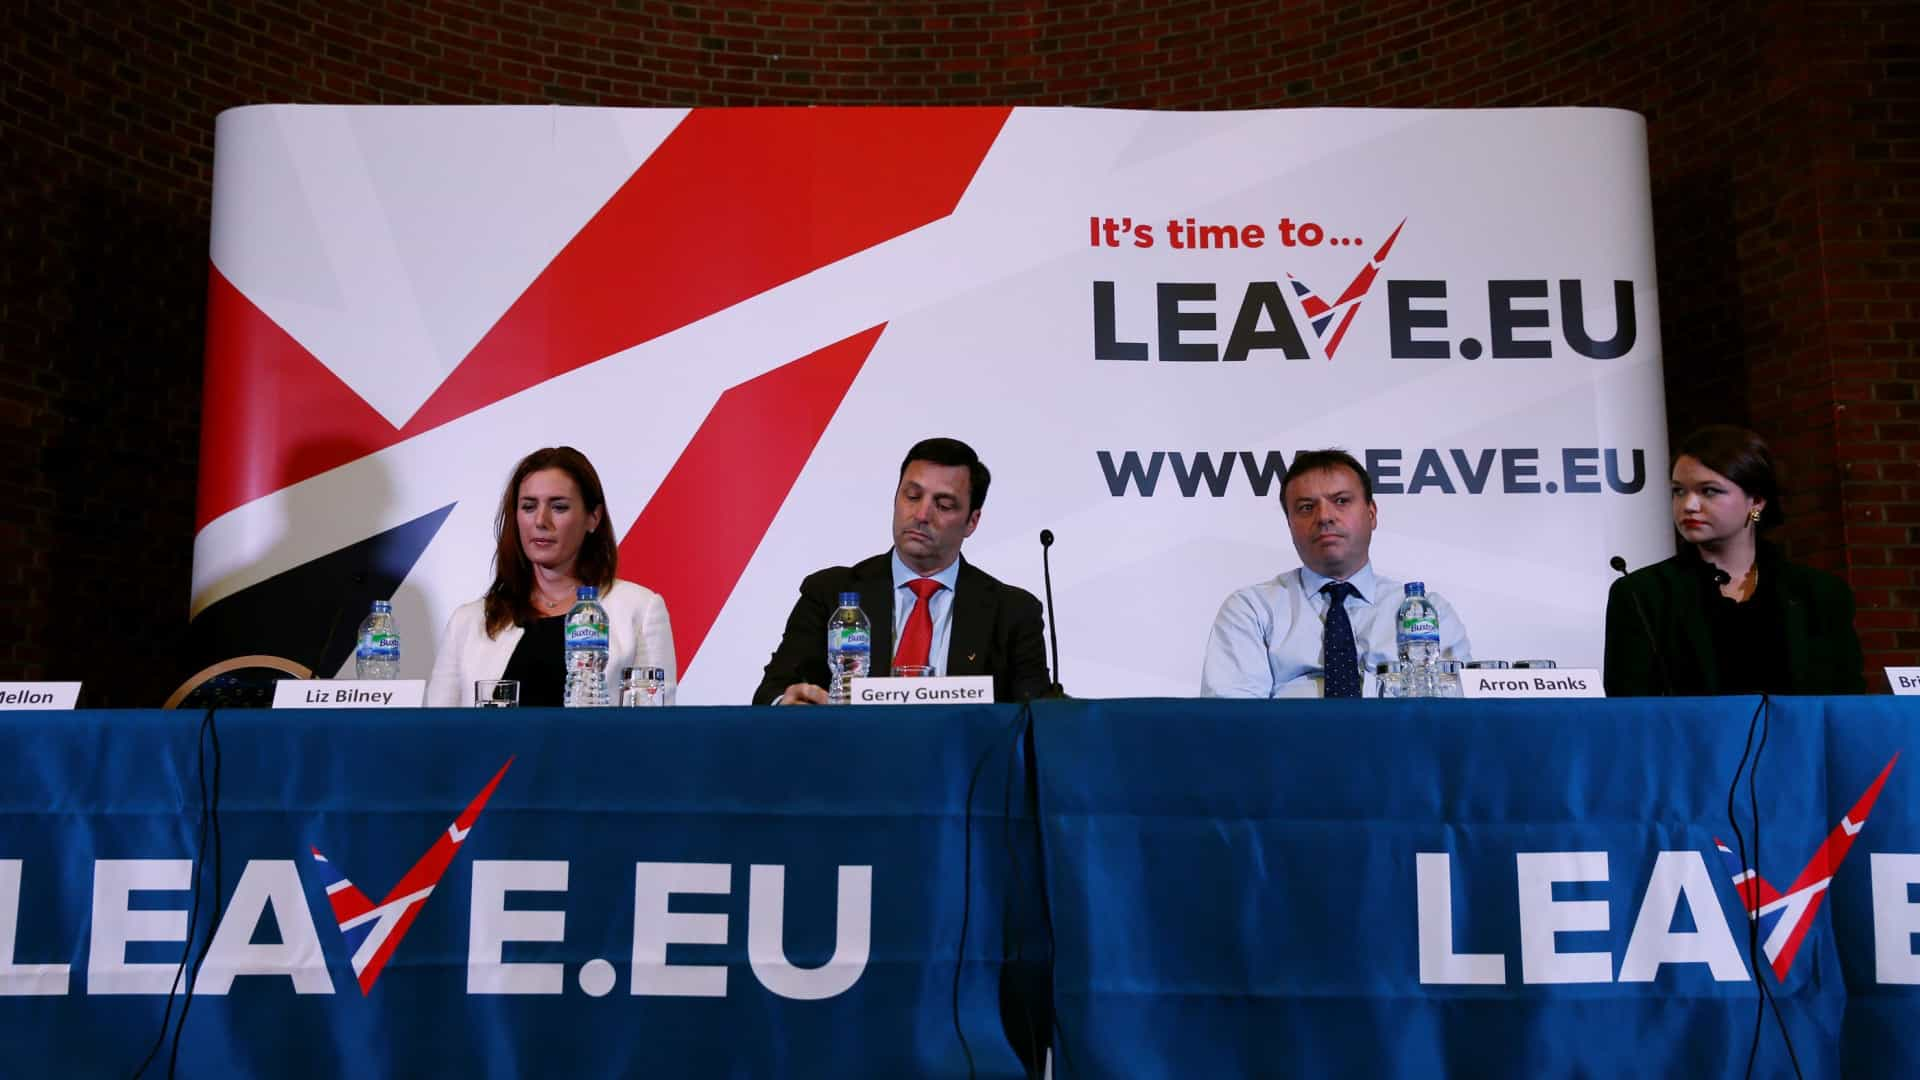 Brexit: Campanha oficial Vote Leave multada por violar lei eleitoral